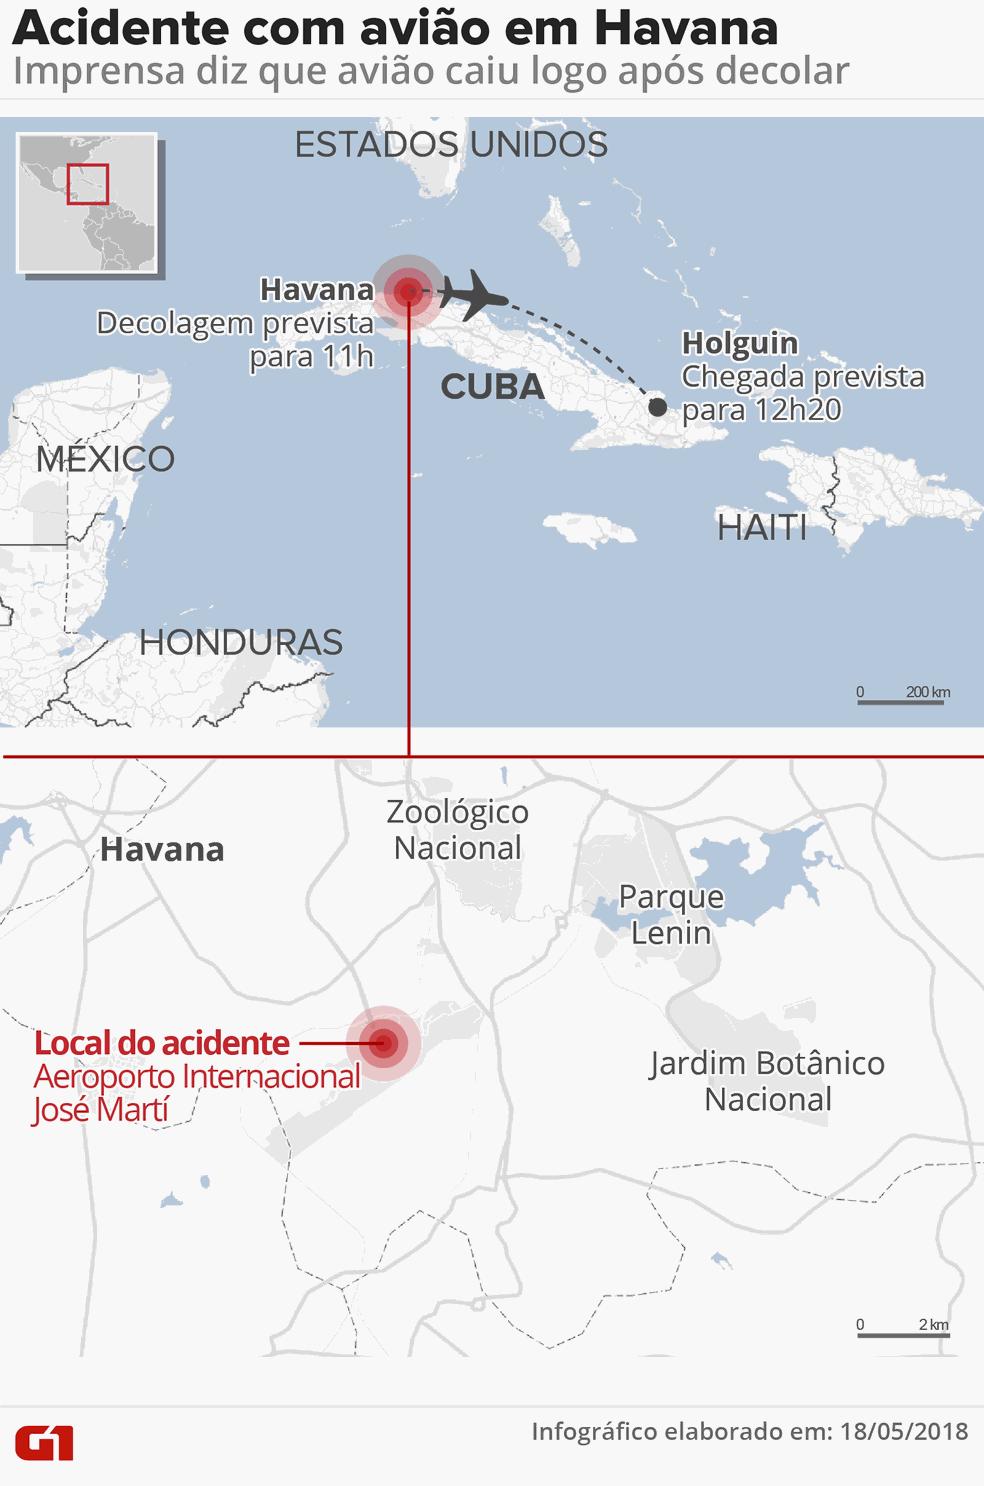 Avião caiu logo após decolar de Havana (Foto: Infografia: Roberta Jaworski/G1)